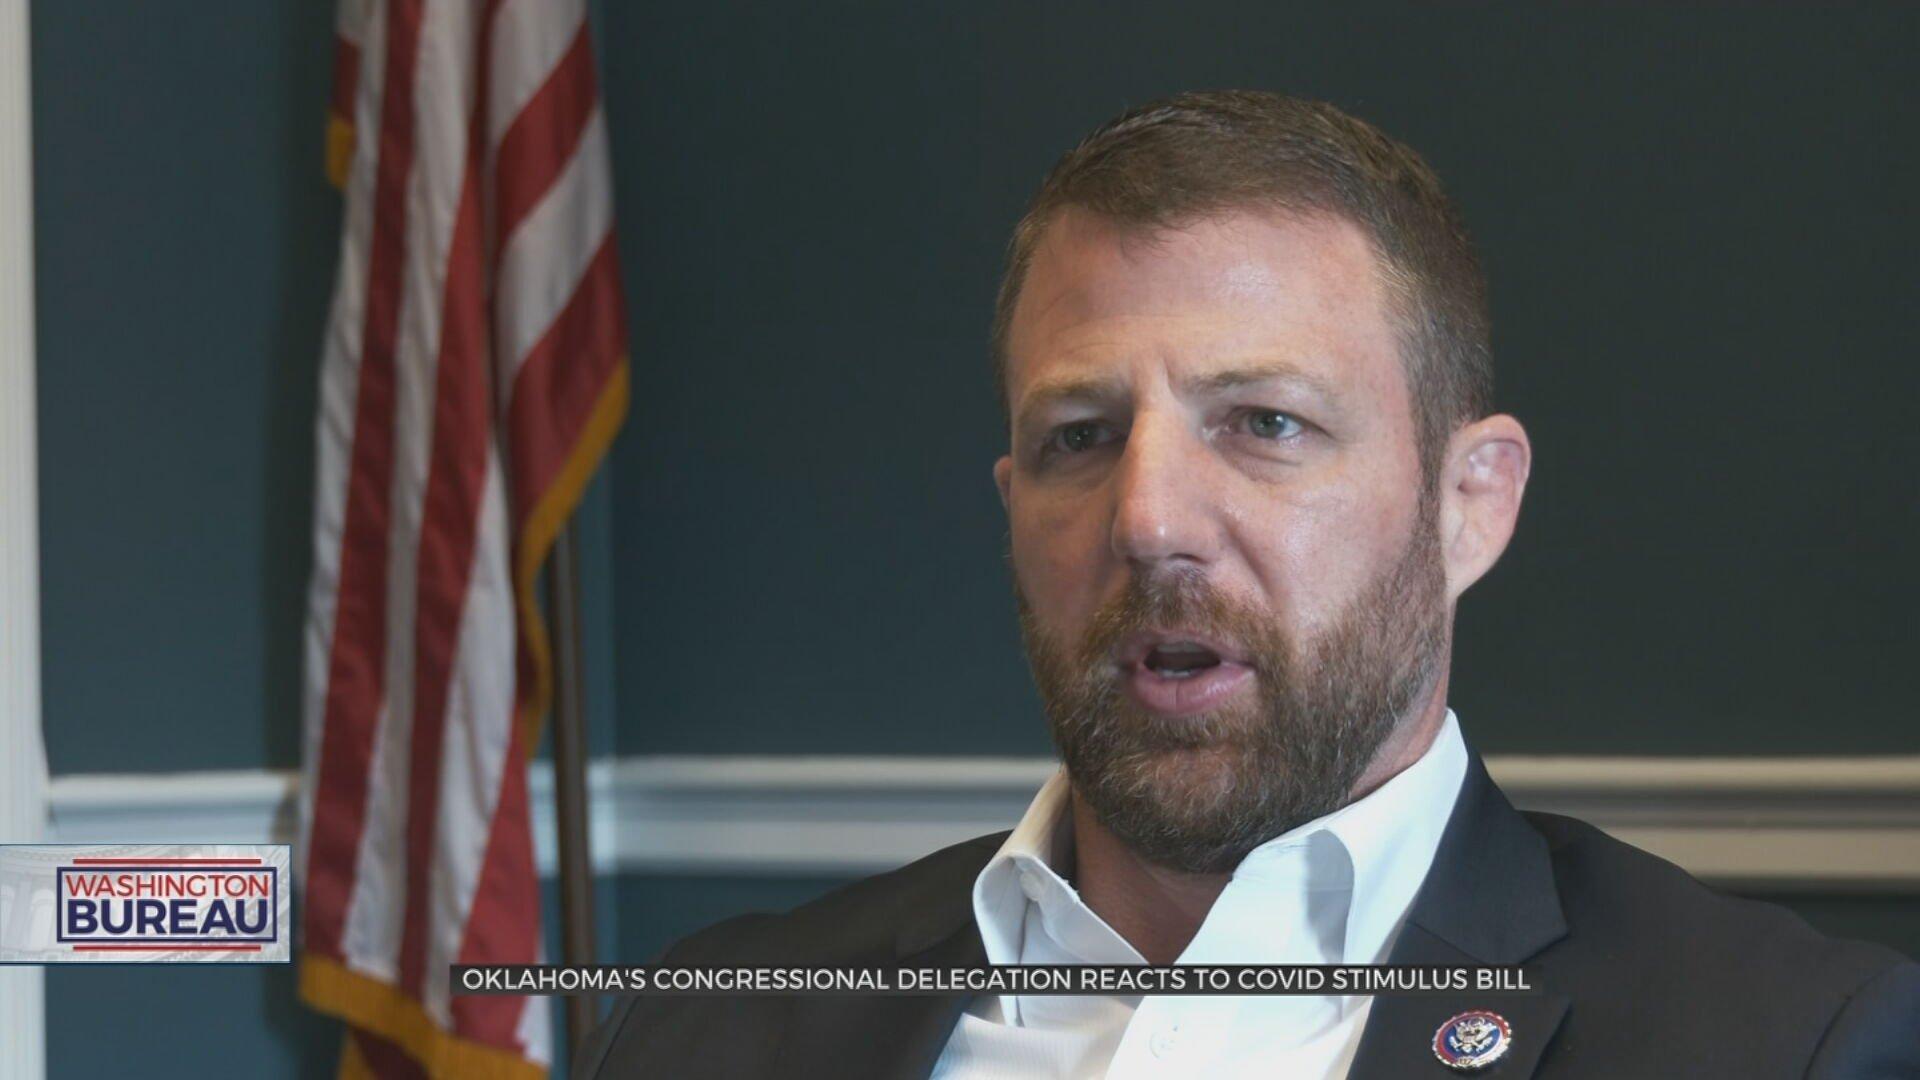 Stimulus Bill Support Split Along Party Lines, Okla. Congressmen Say It Goes Too Far